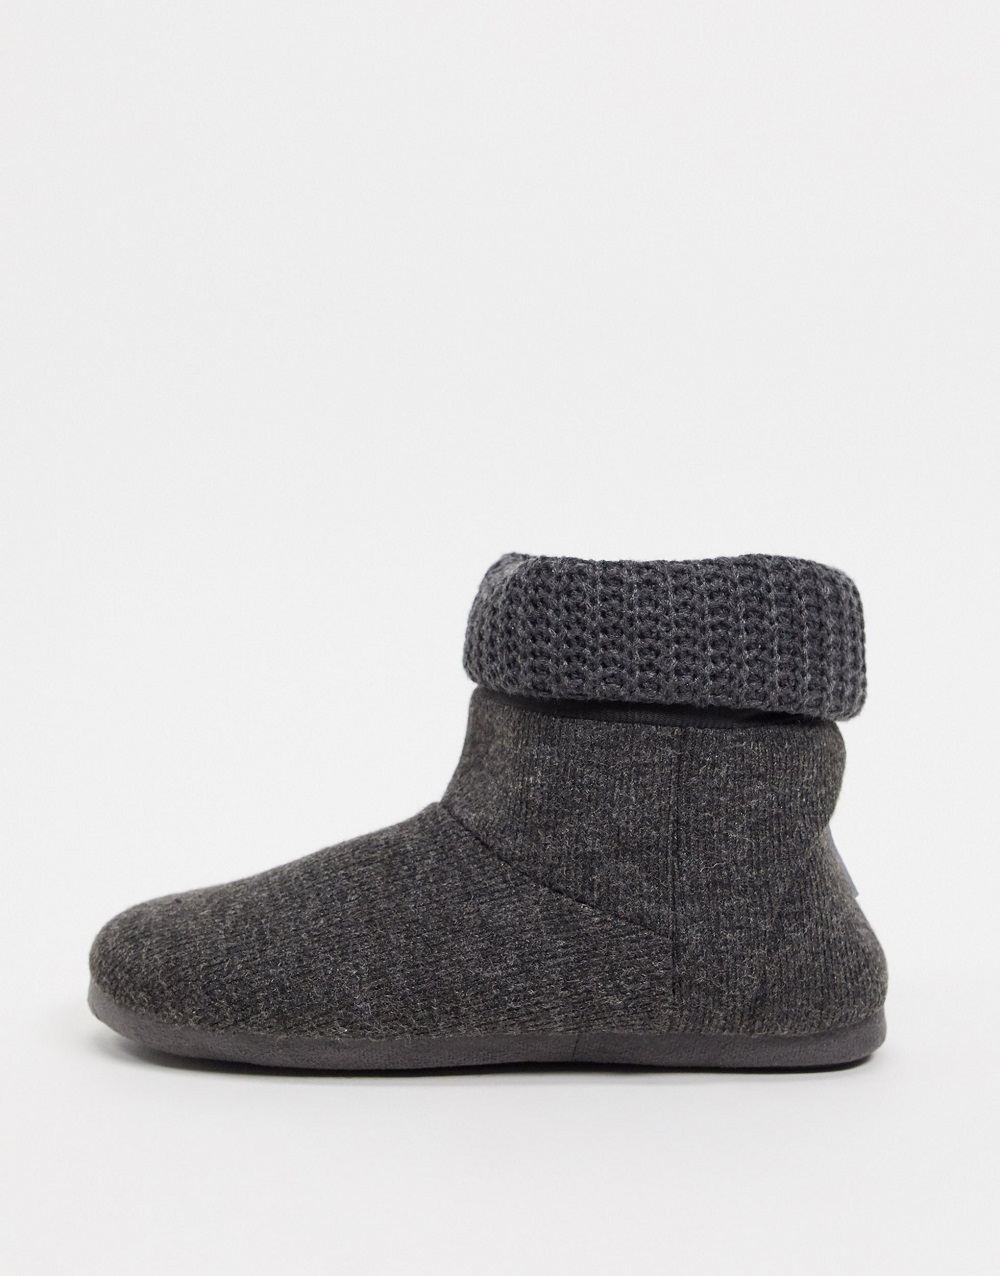 Dunlop buce papuče zima 2020./2021.